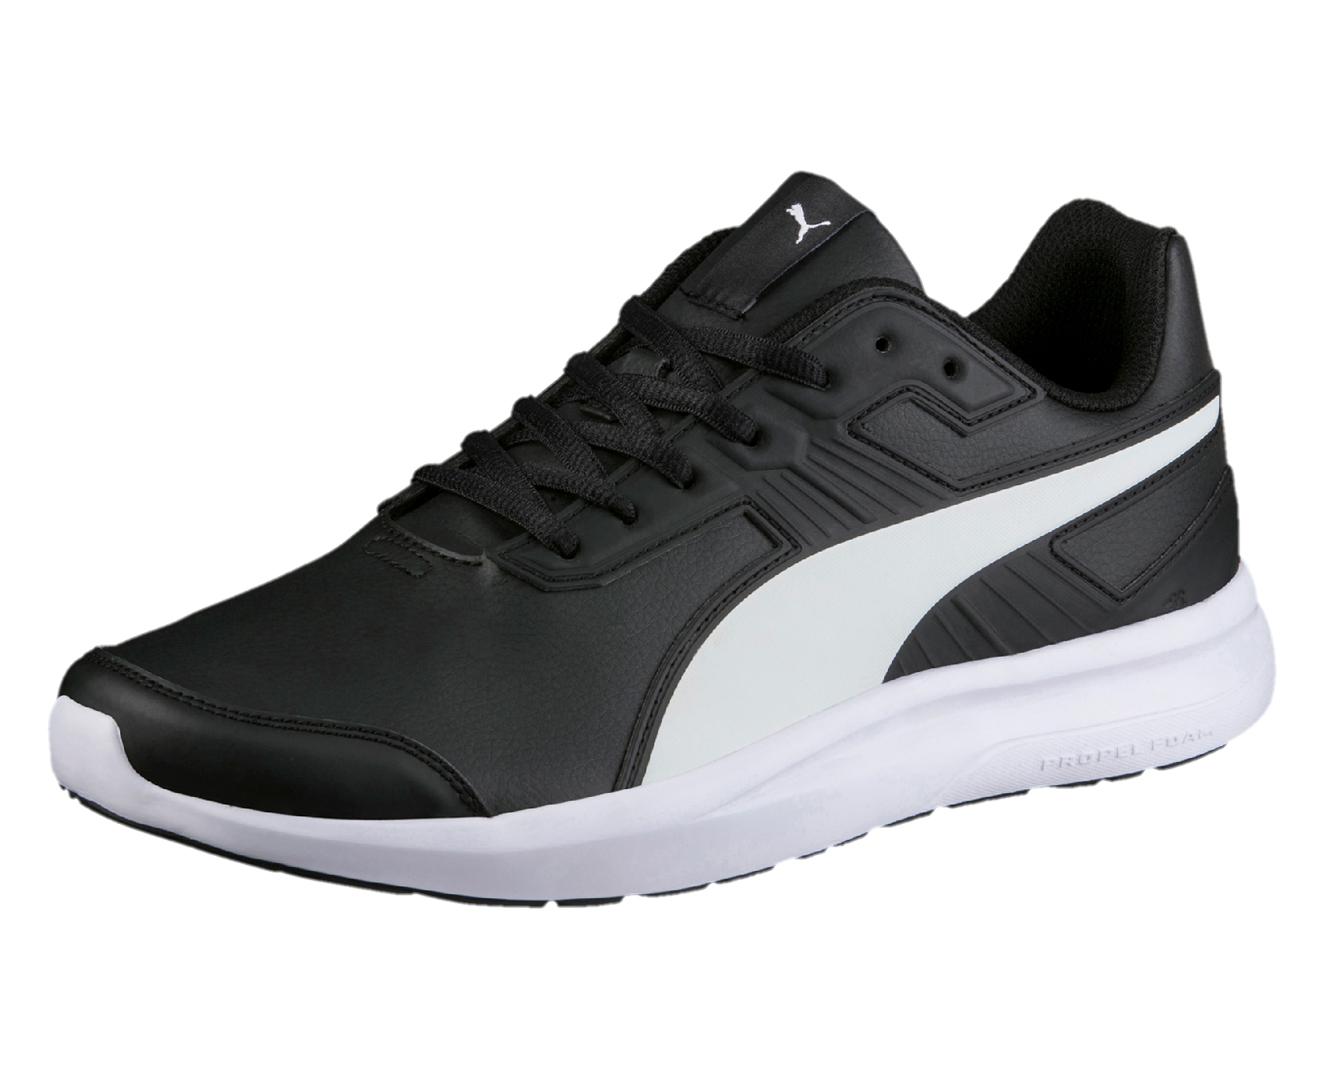 Puma Men's Escaper SL Shoes BlackWhite